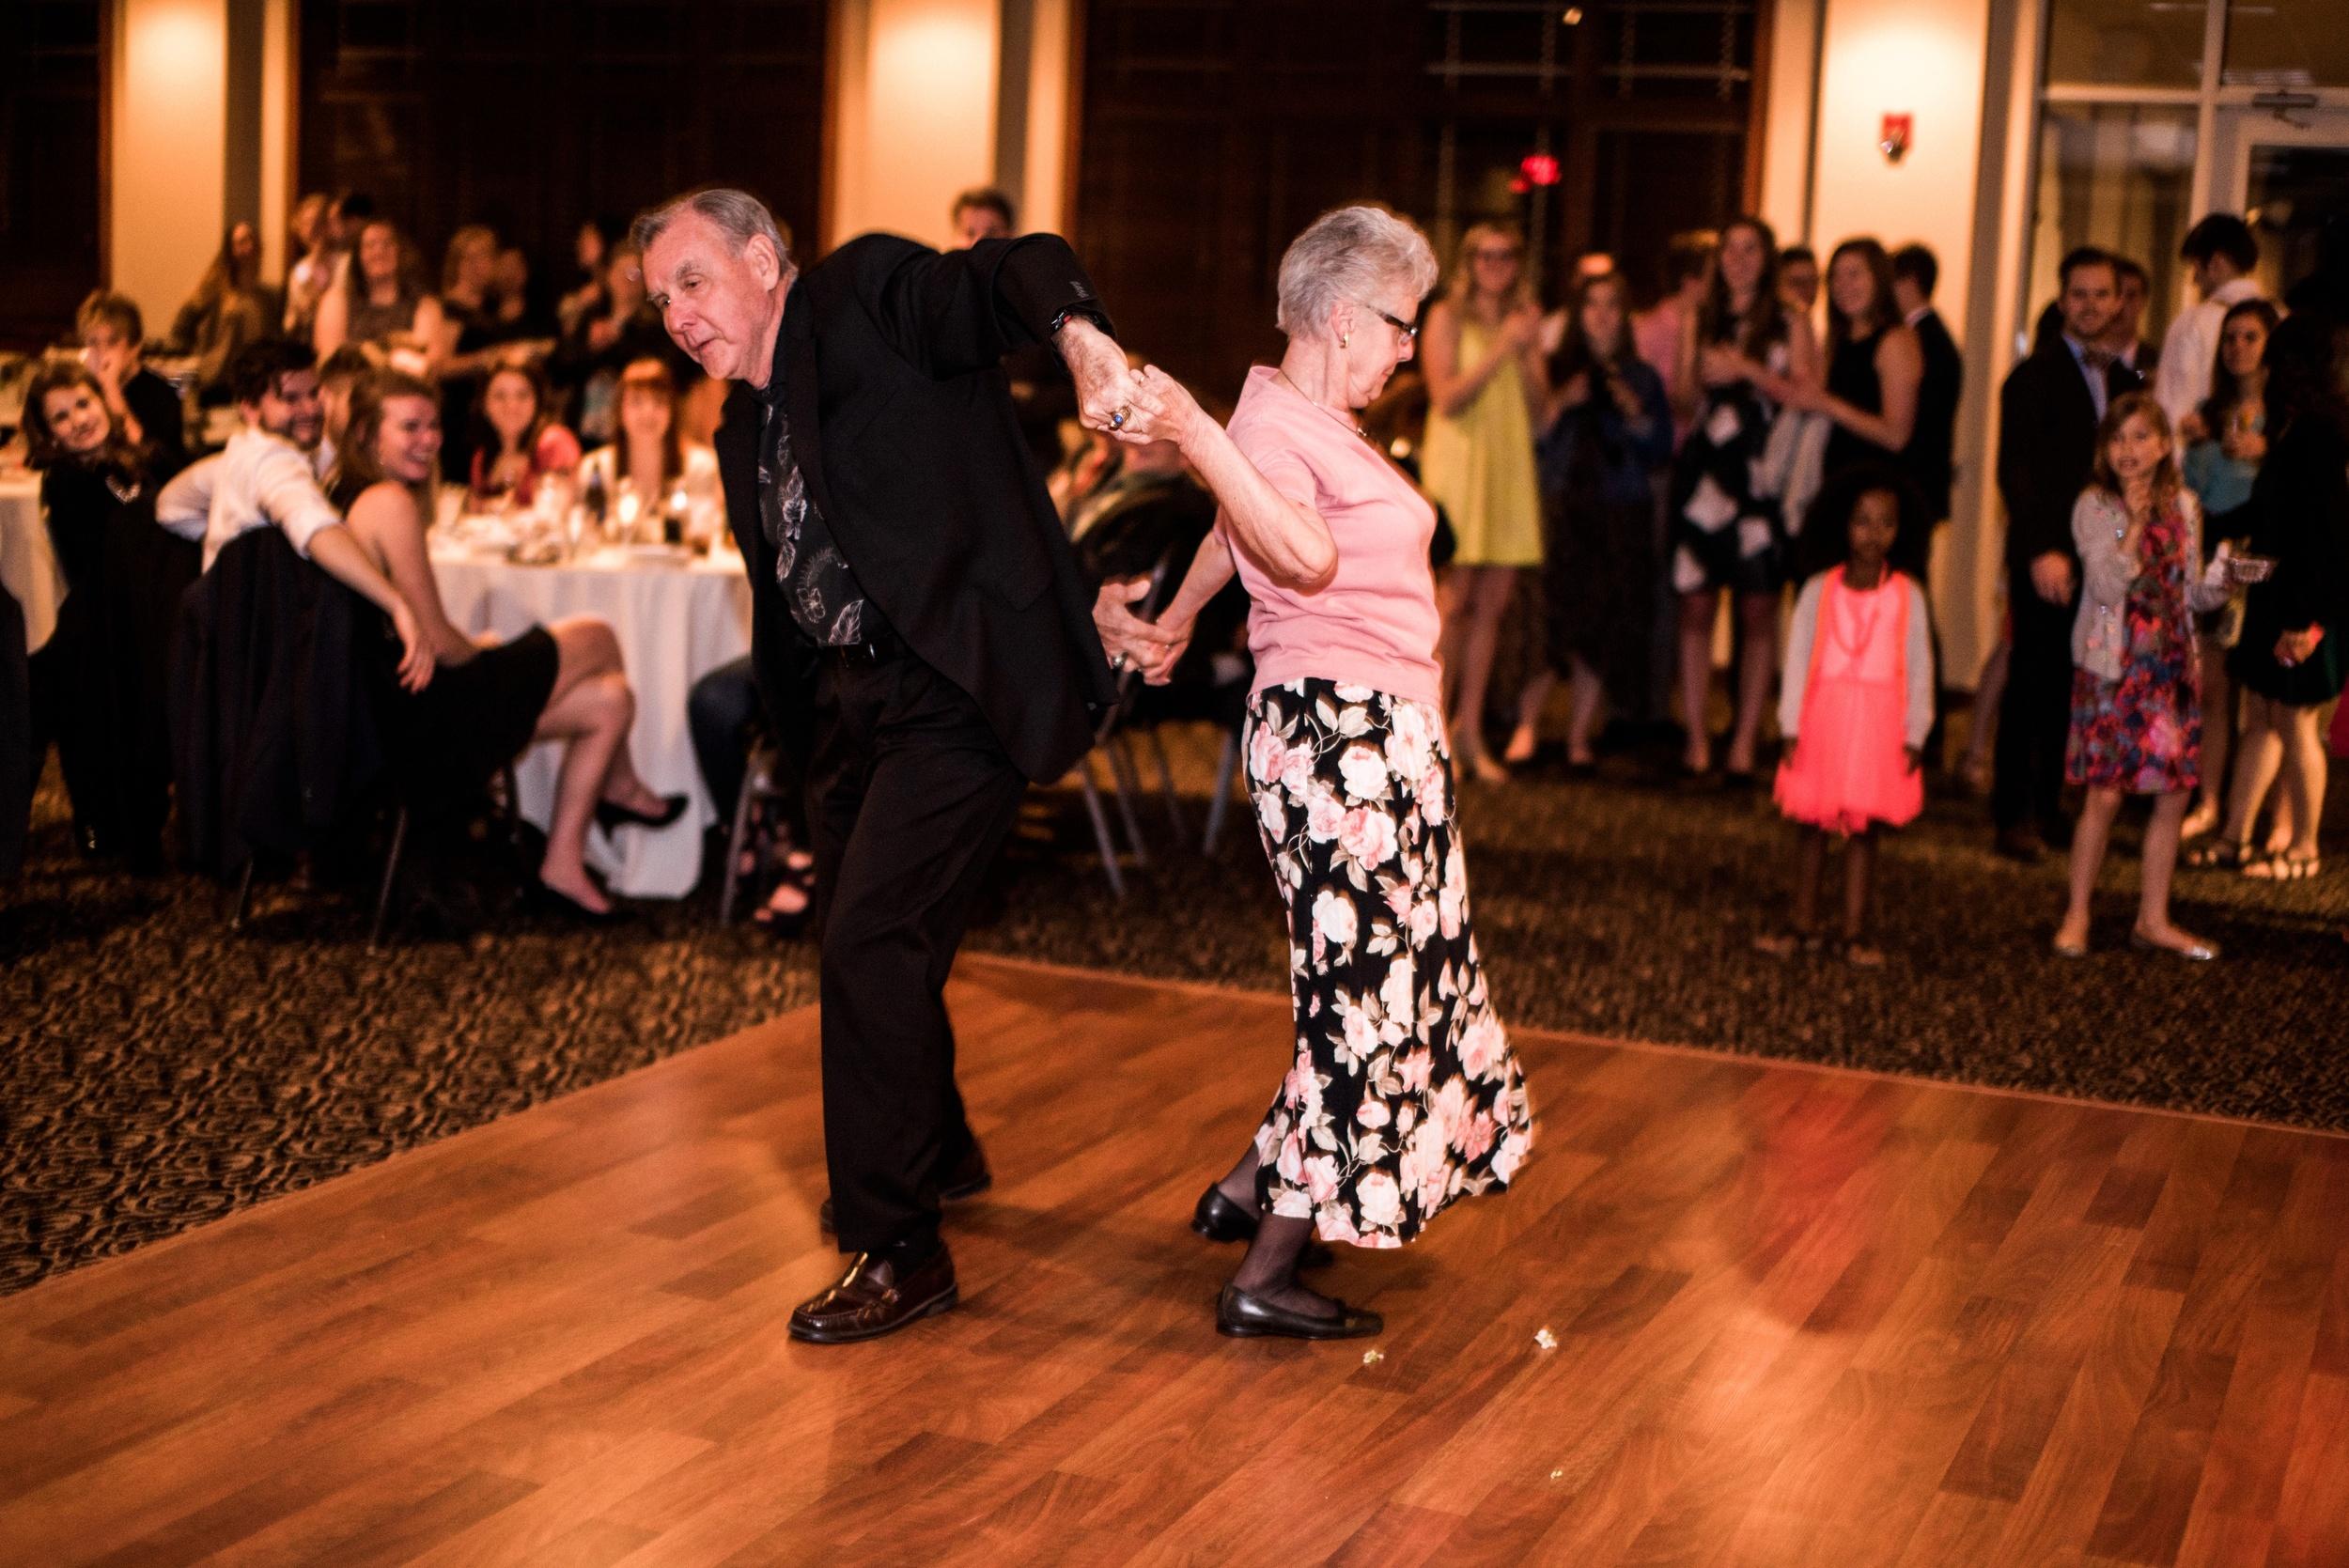 Pleasant Hill Des Moines Wedding Photographer_2192.jpg